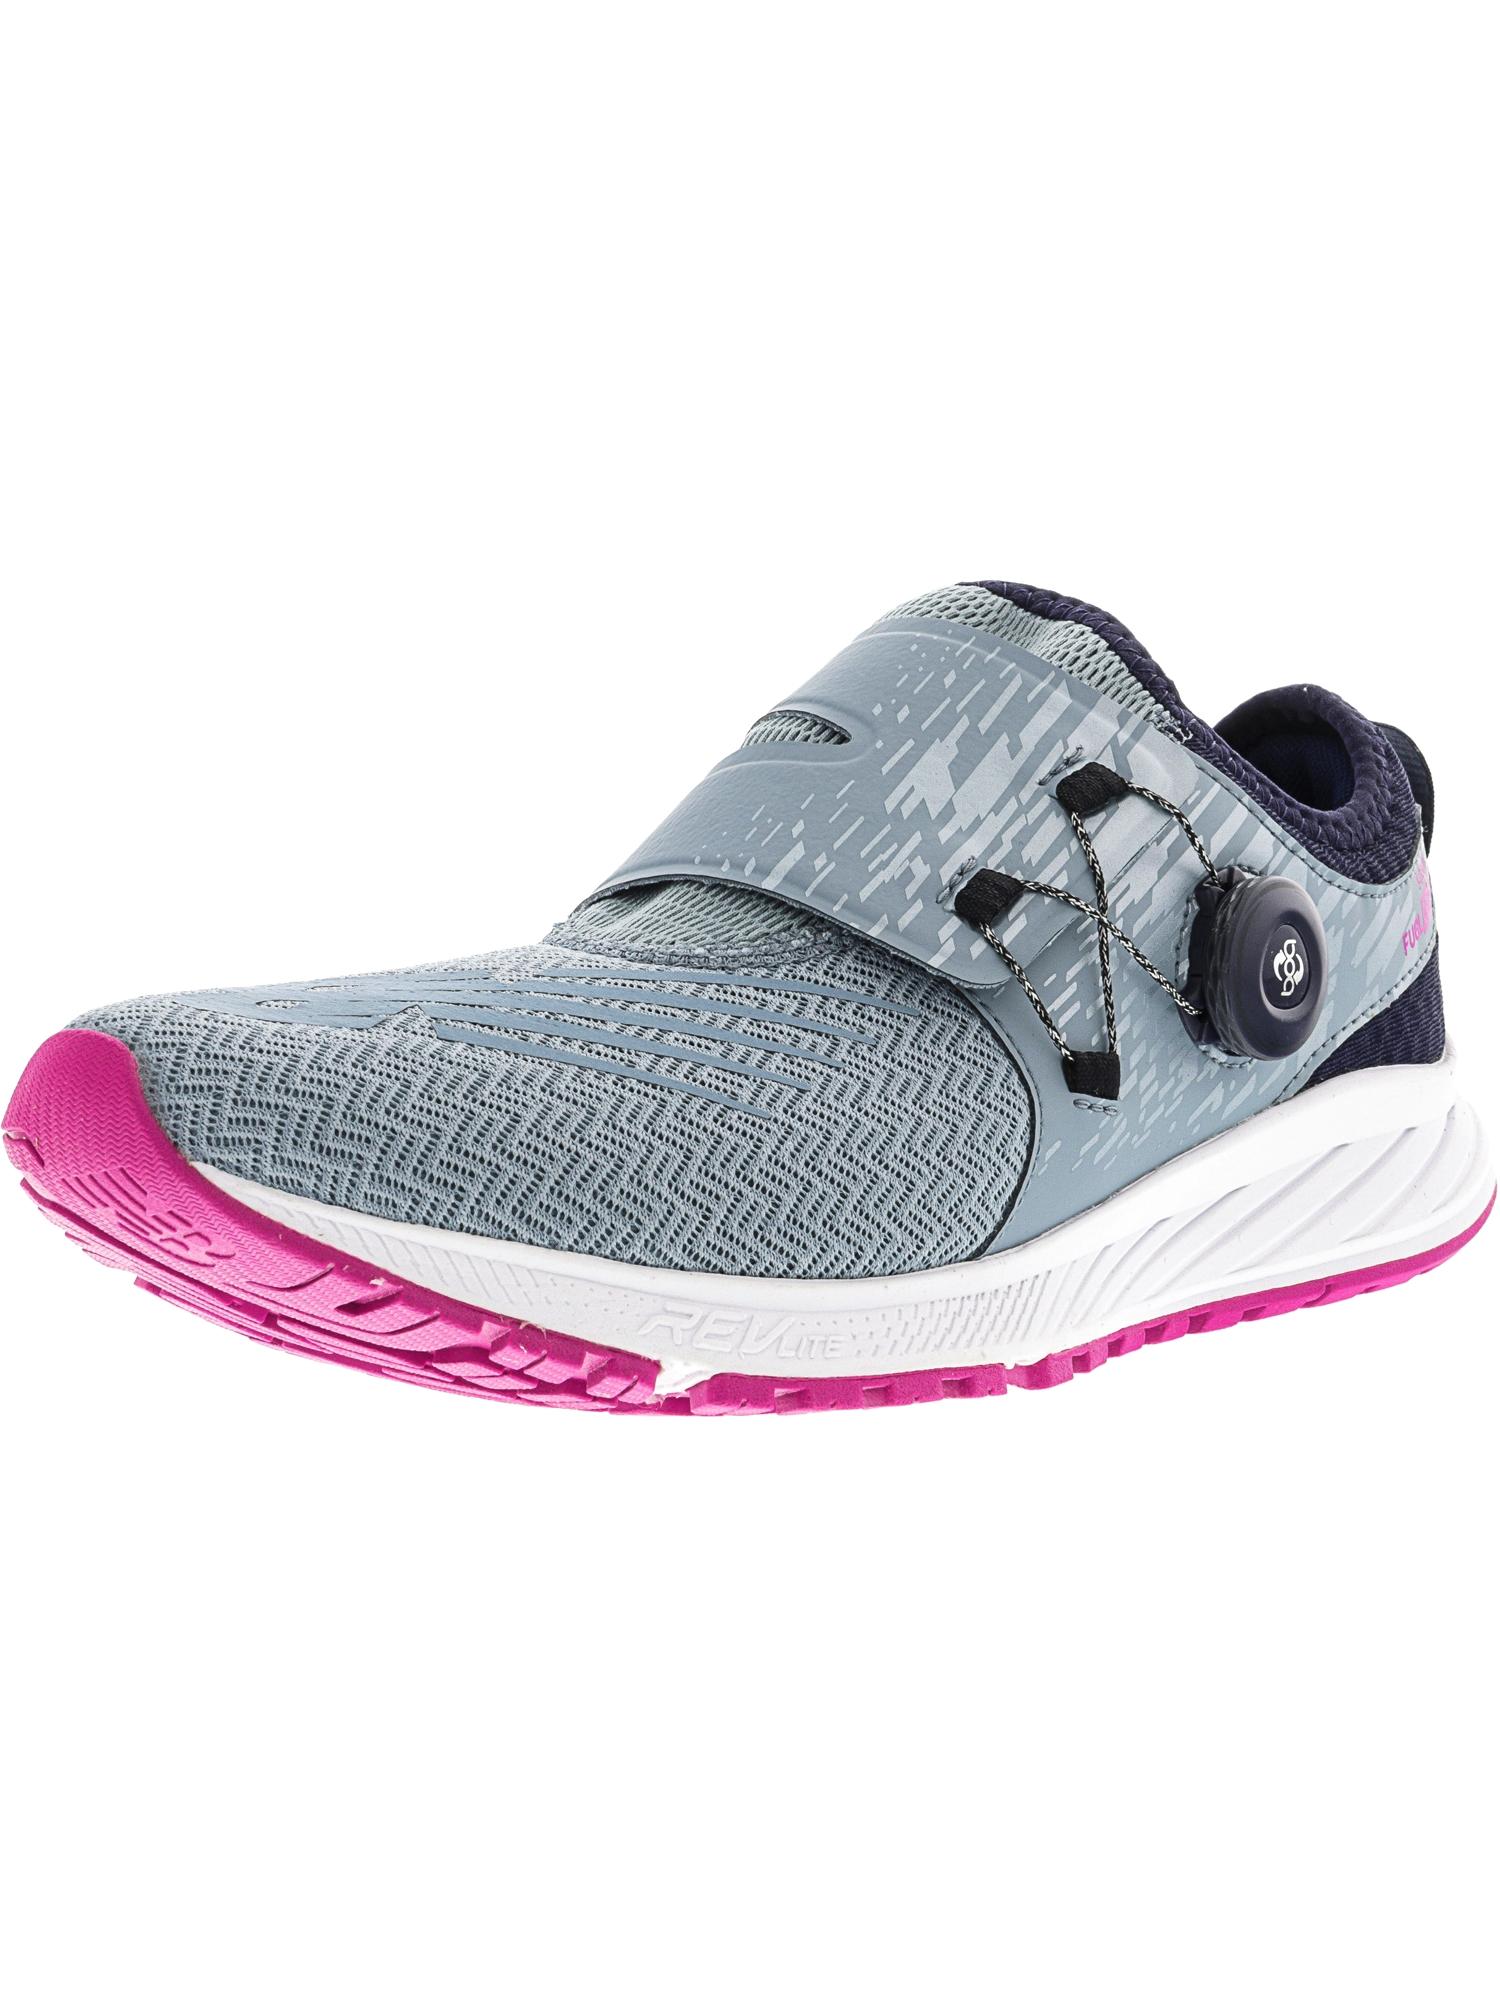 New Balance Women's Wsoni Gr 6W Ankle-High Running Shoe - 6W Gr e6fe5e